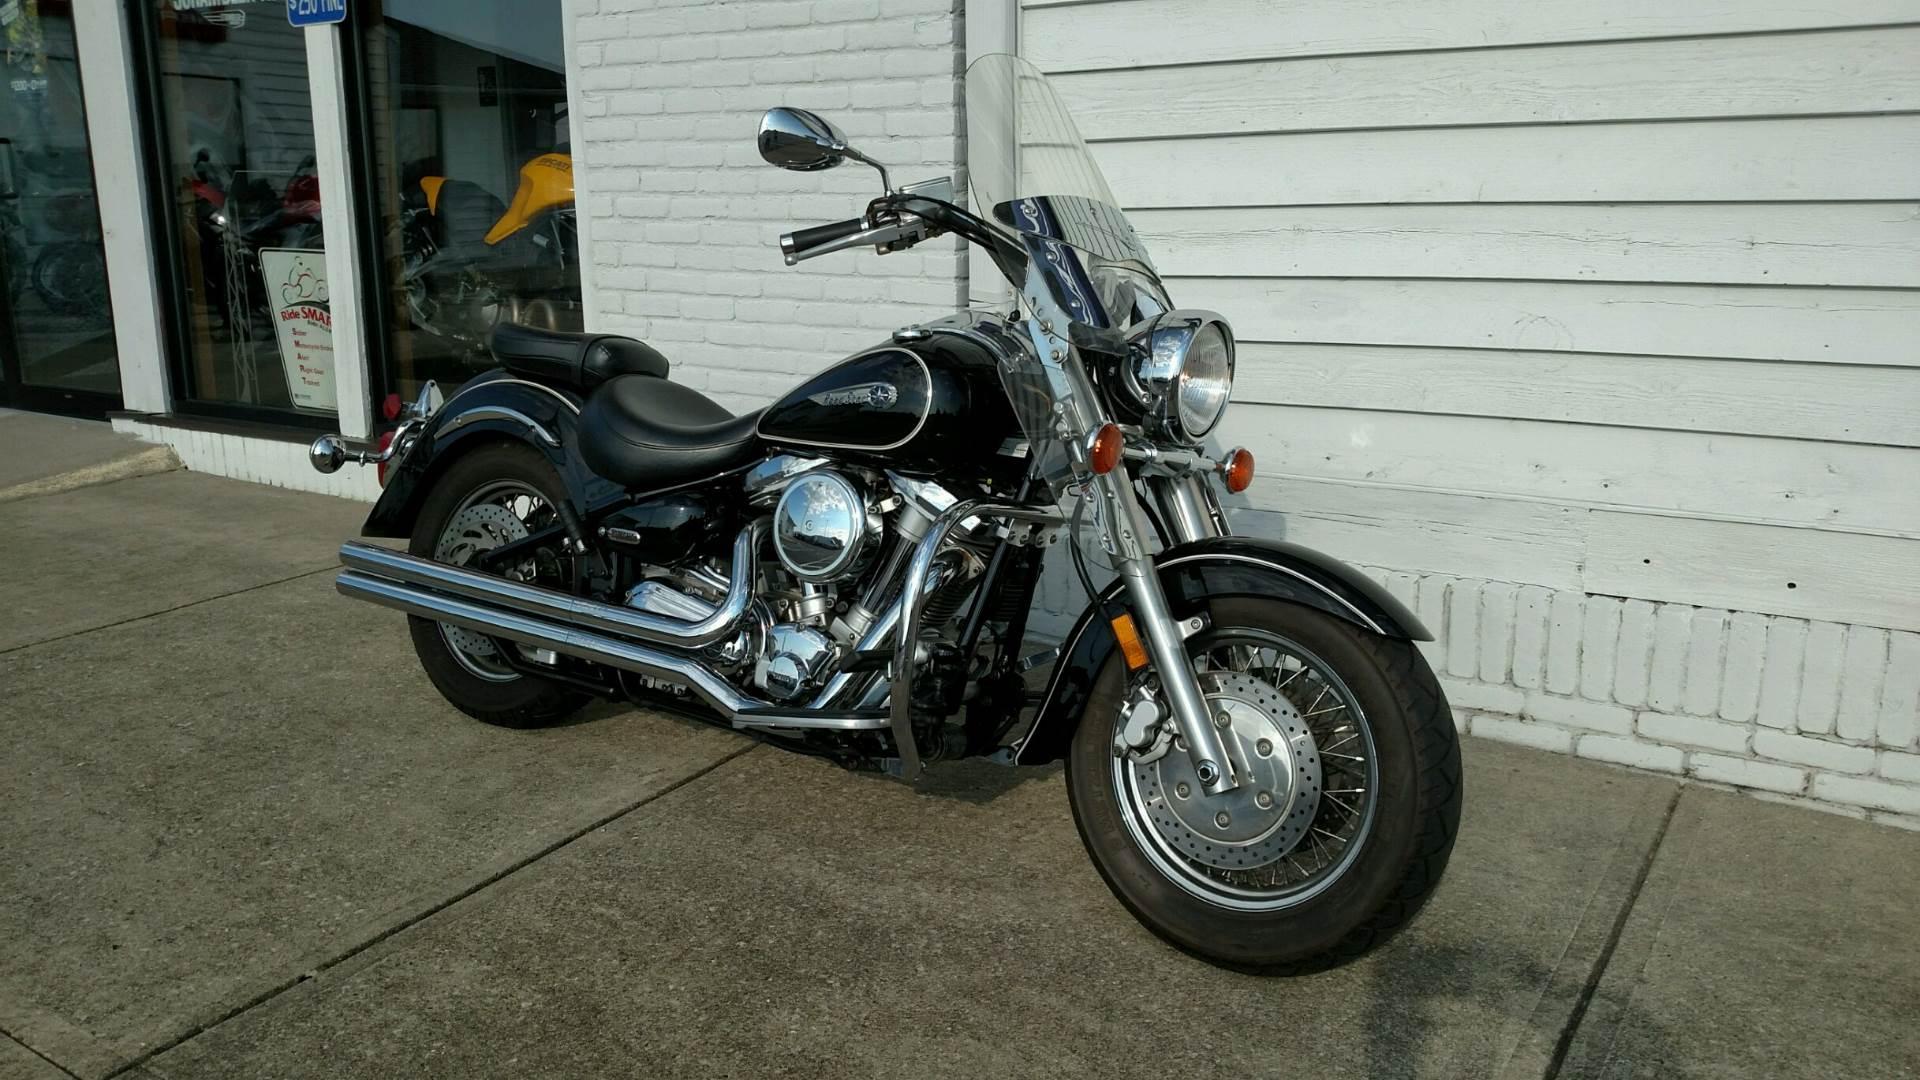 Honda Dealers Dayton Ohio >> honda motorcycle dealers cincinnati | Newmotorjdi.co